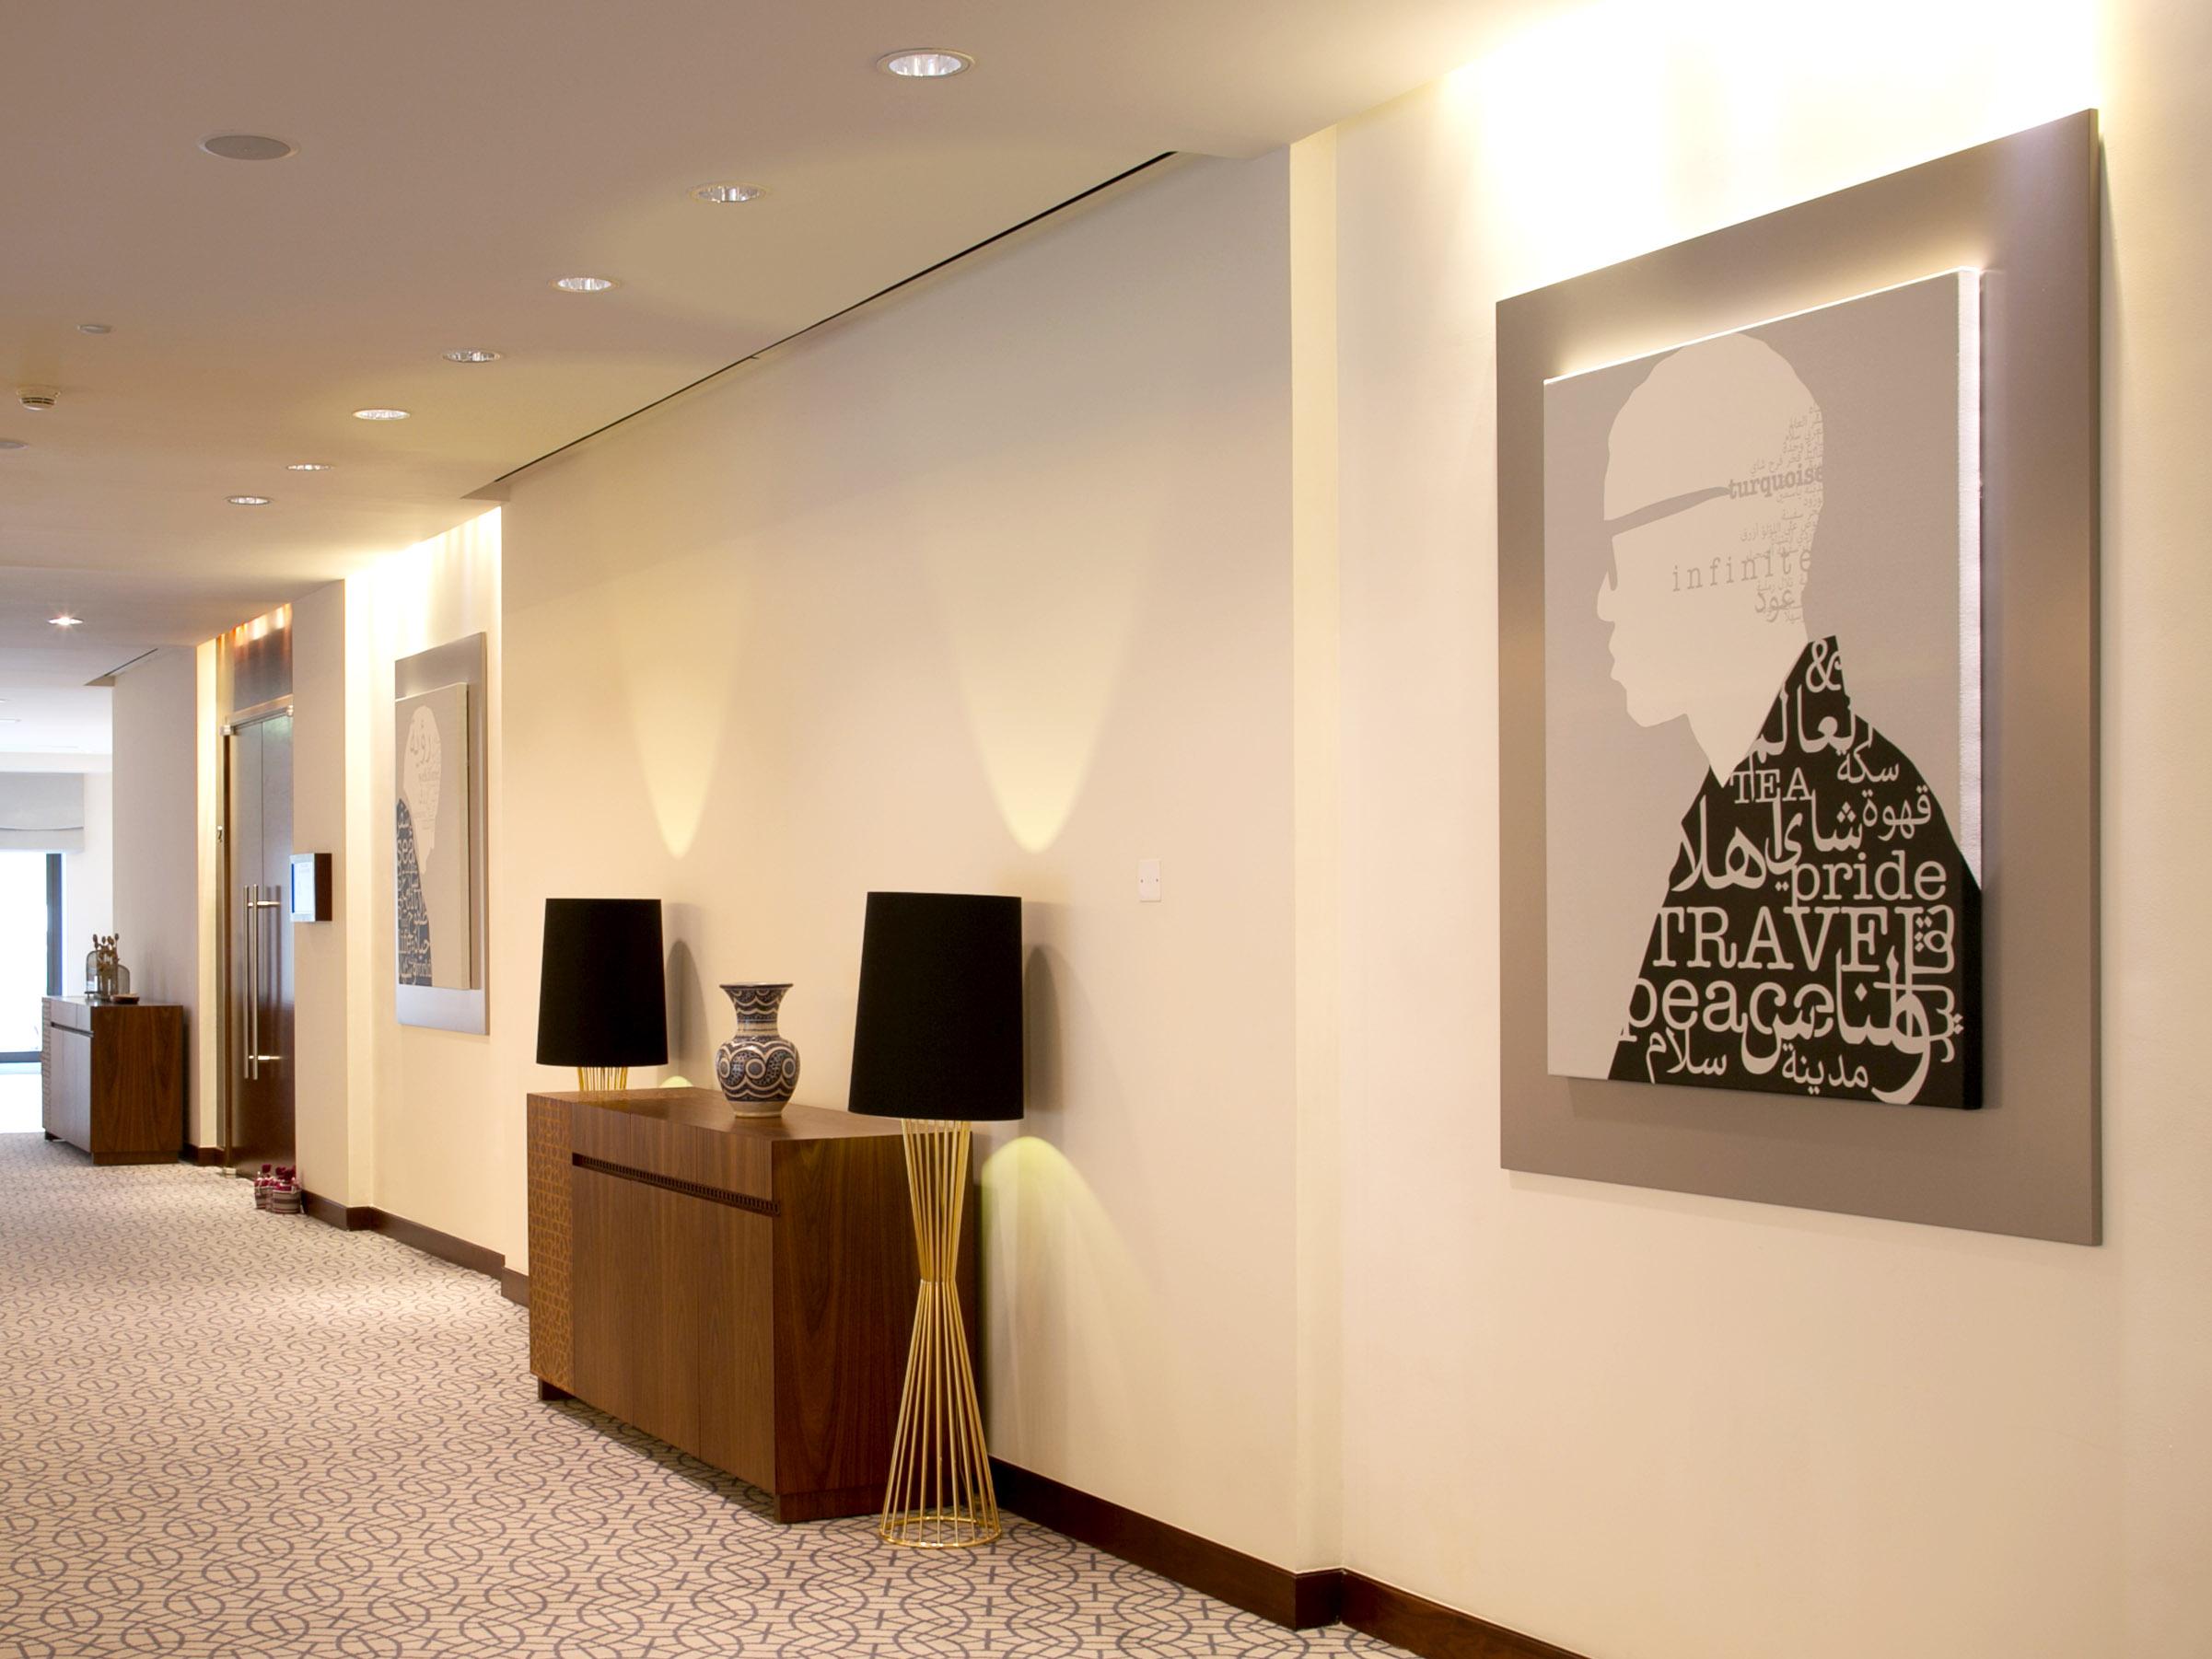 02-capsule-arts-projects-al-manzil-downtown-corridor.jpg